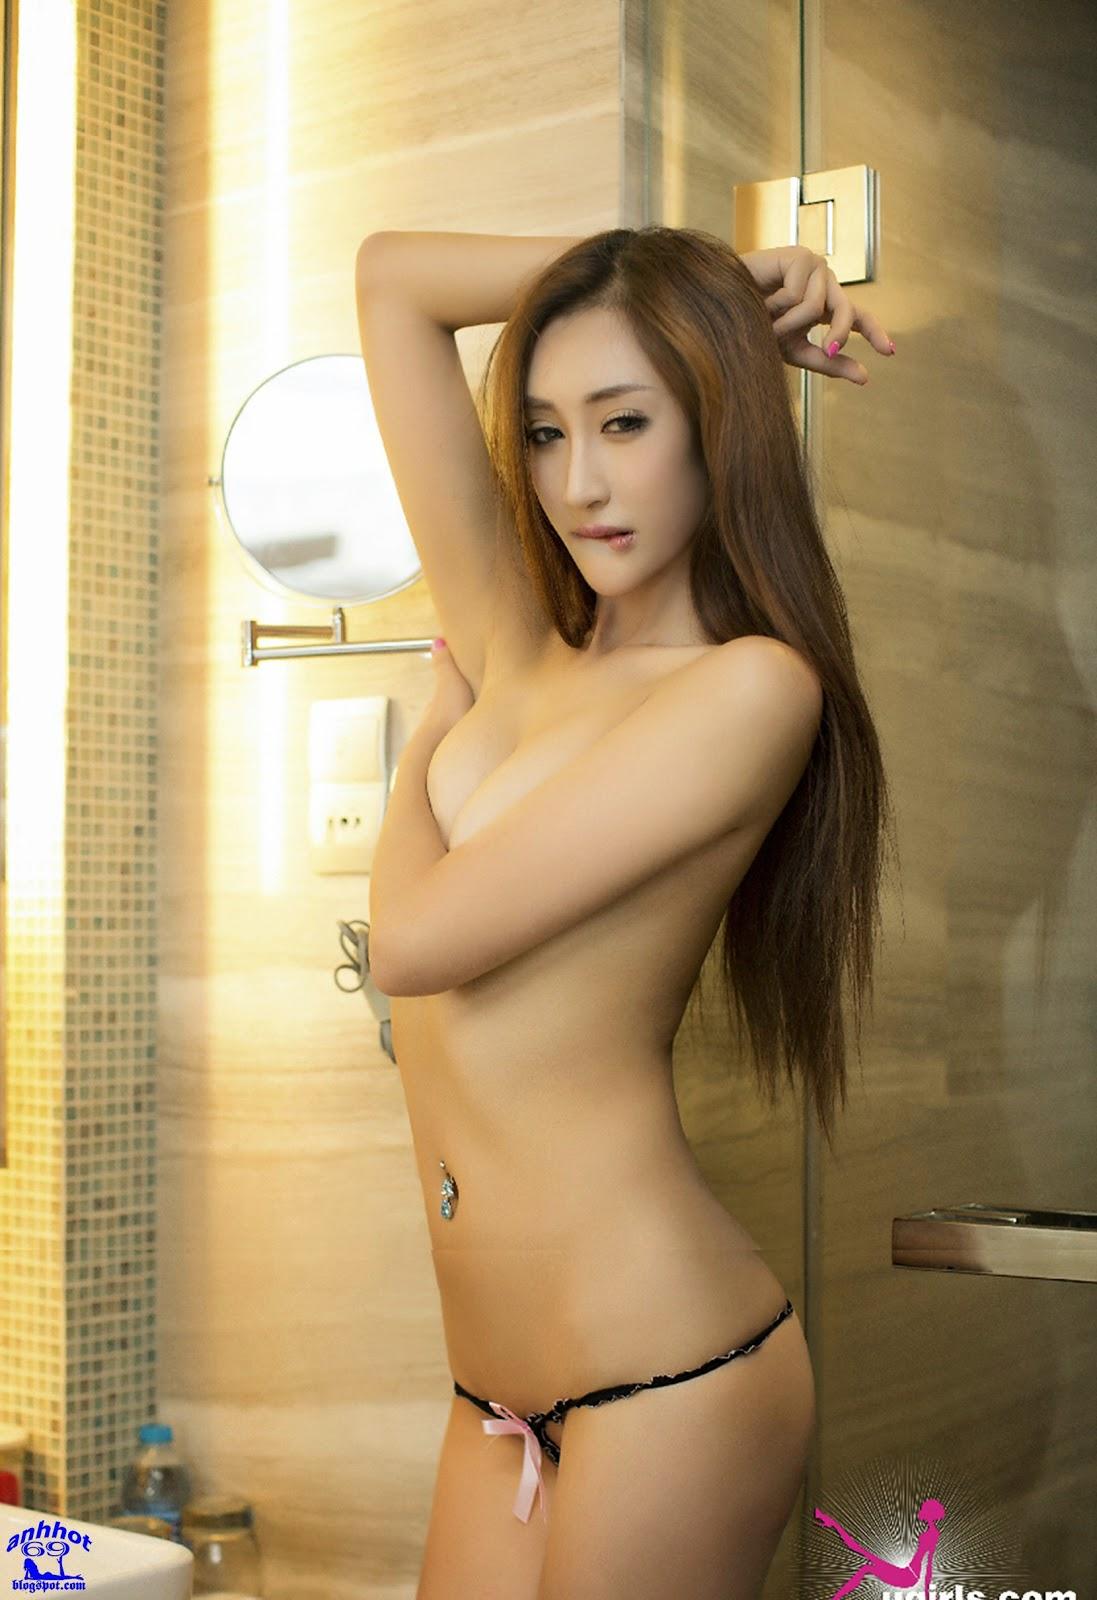 [Ugirls-1412181650] - Phòng tắm trong suốt!